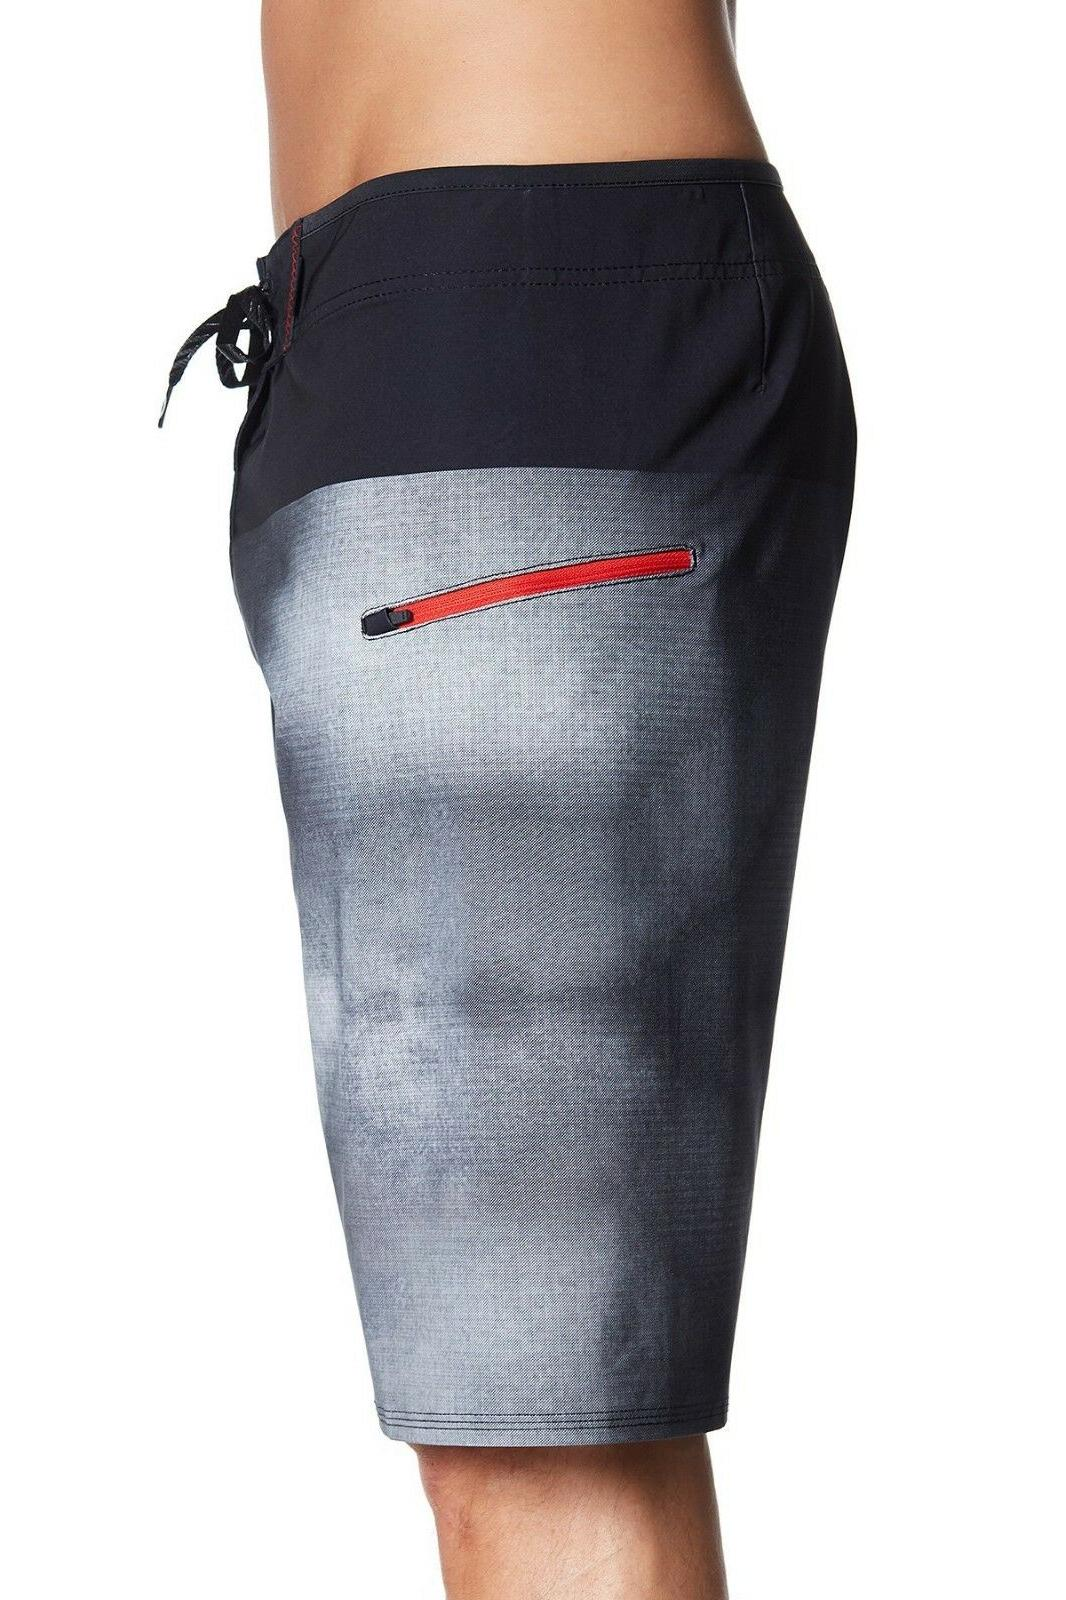 Oakley Men's Sumatra 21L Boardshorts Beachwear Size Black New